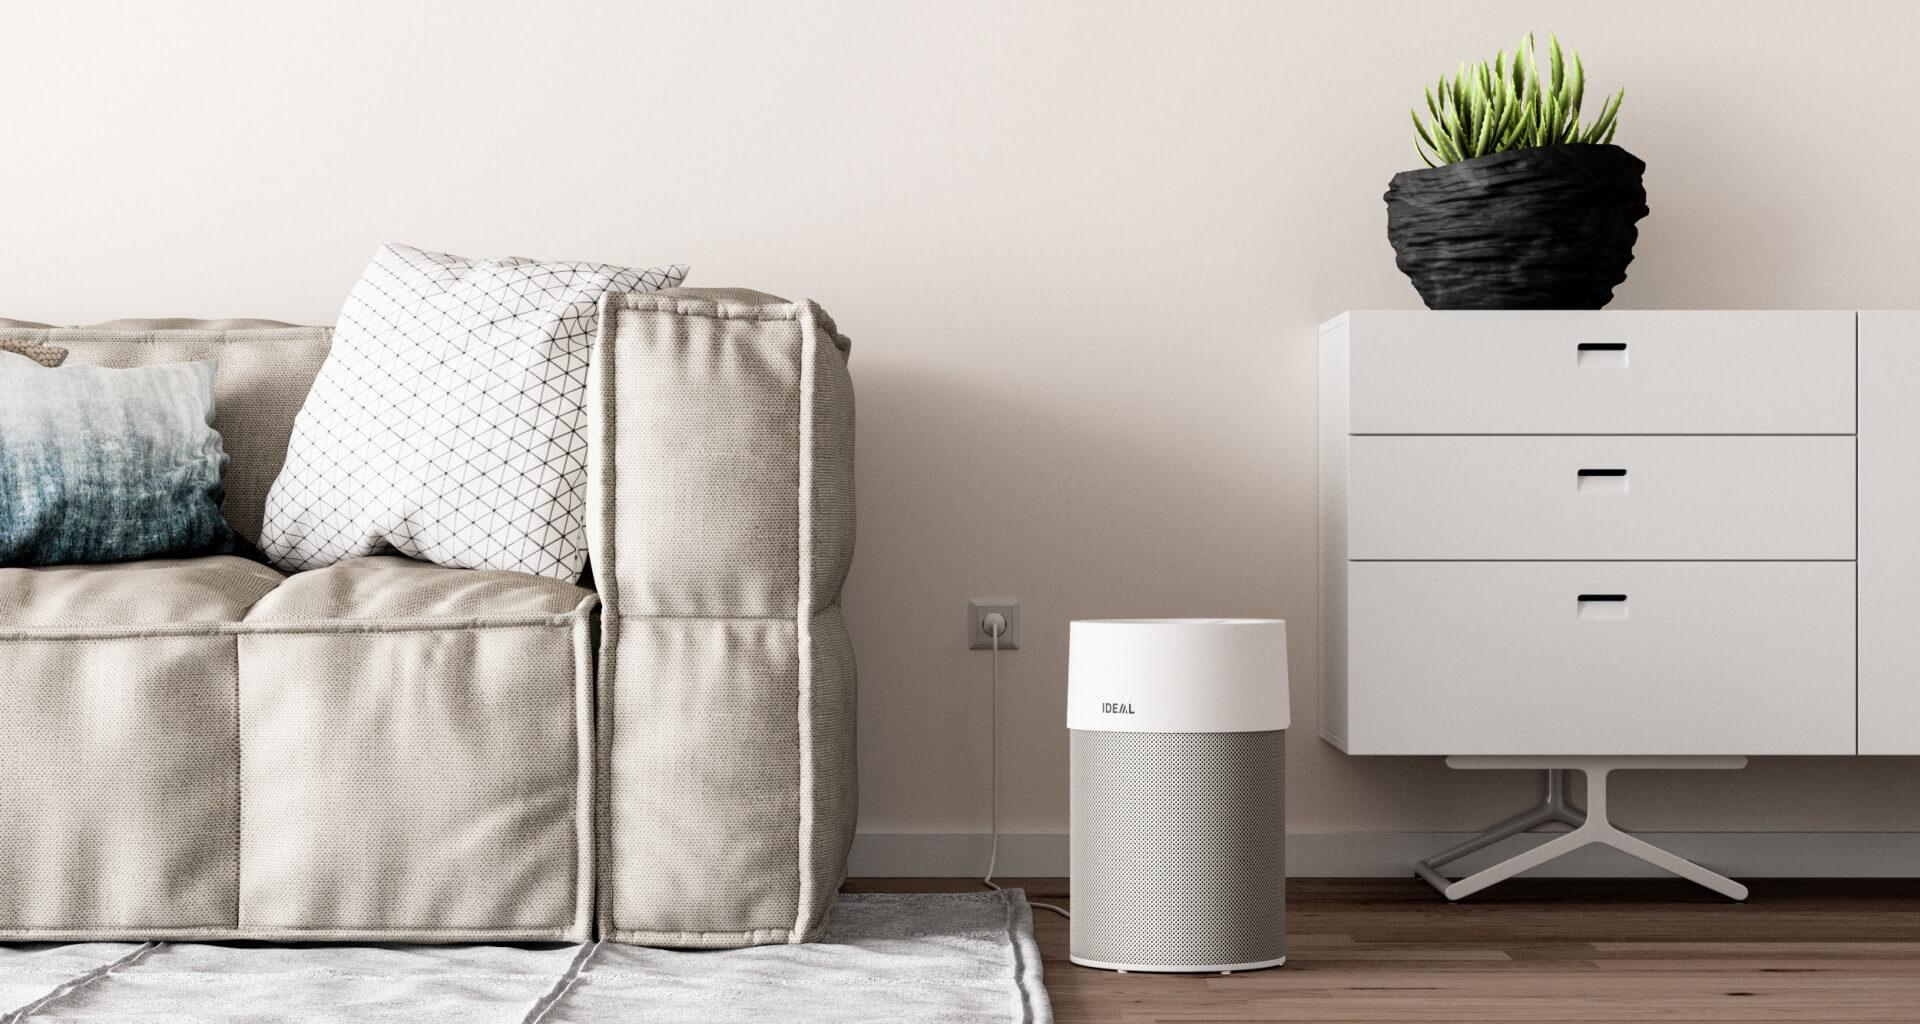 purificator-aer-ambiental-ideal-casa-birou-ap40-pro